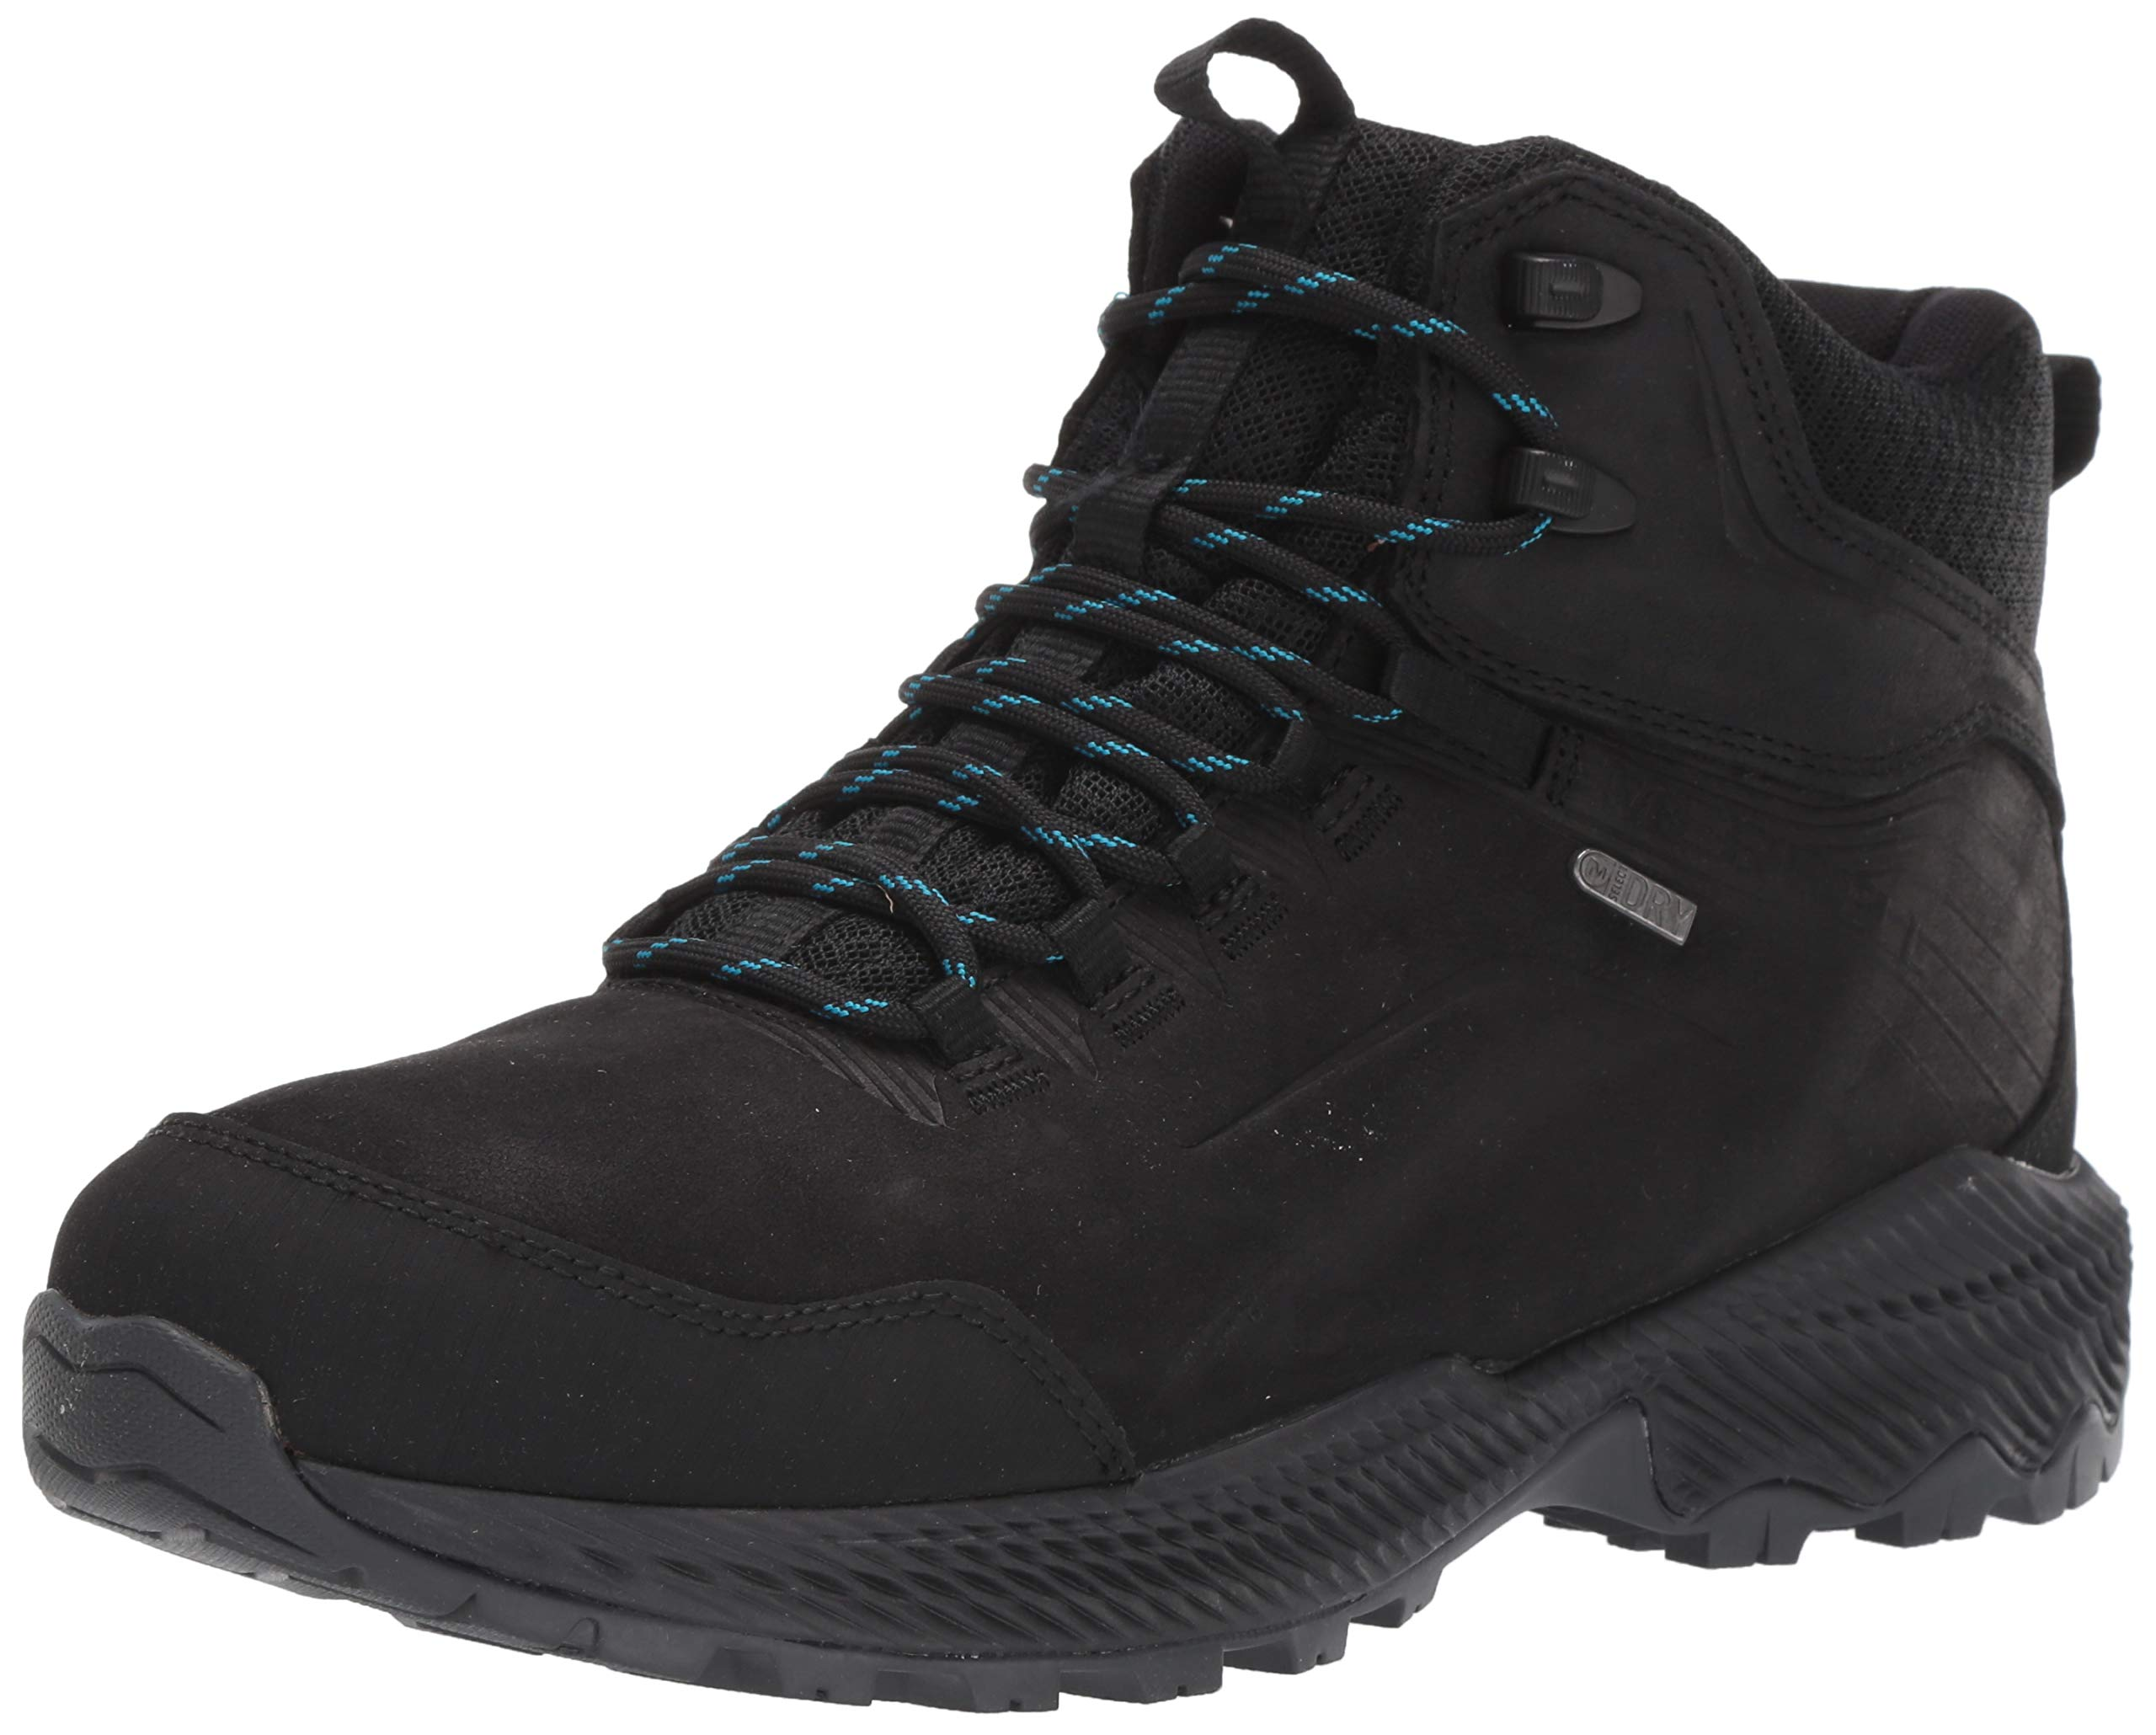 Merrell Men's High Rise Hiking Boots